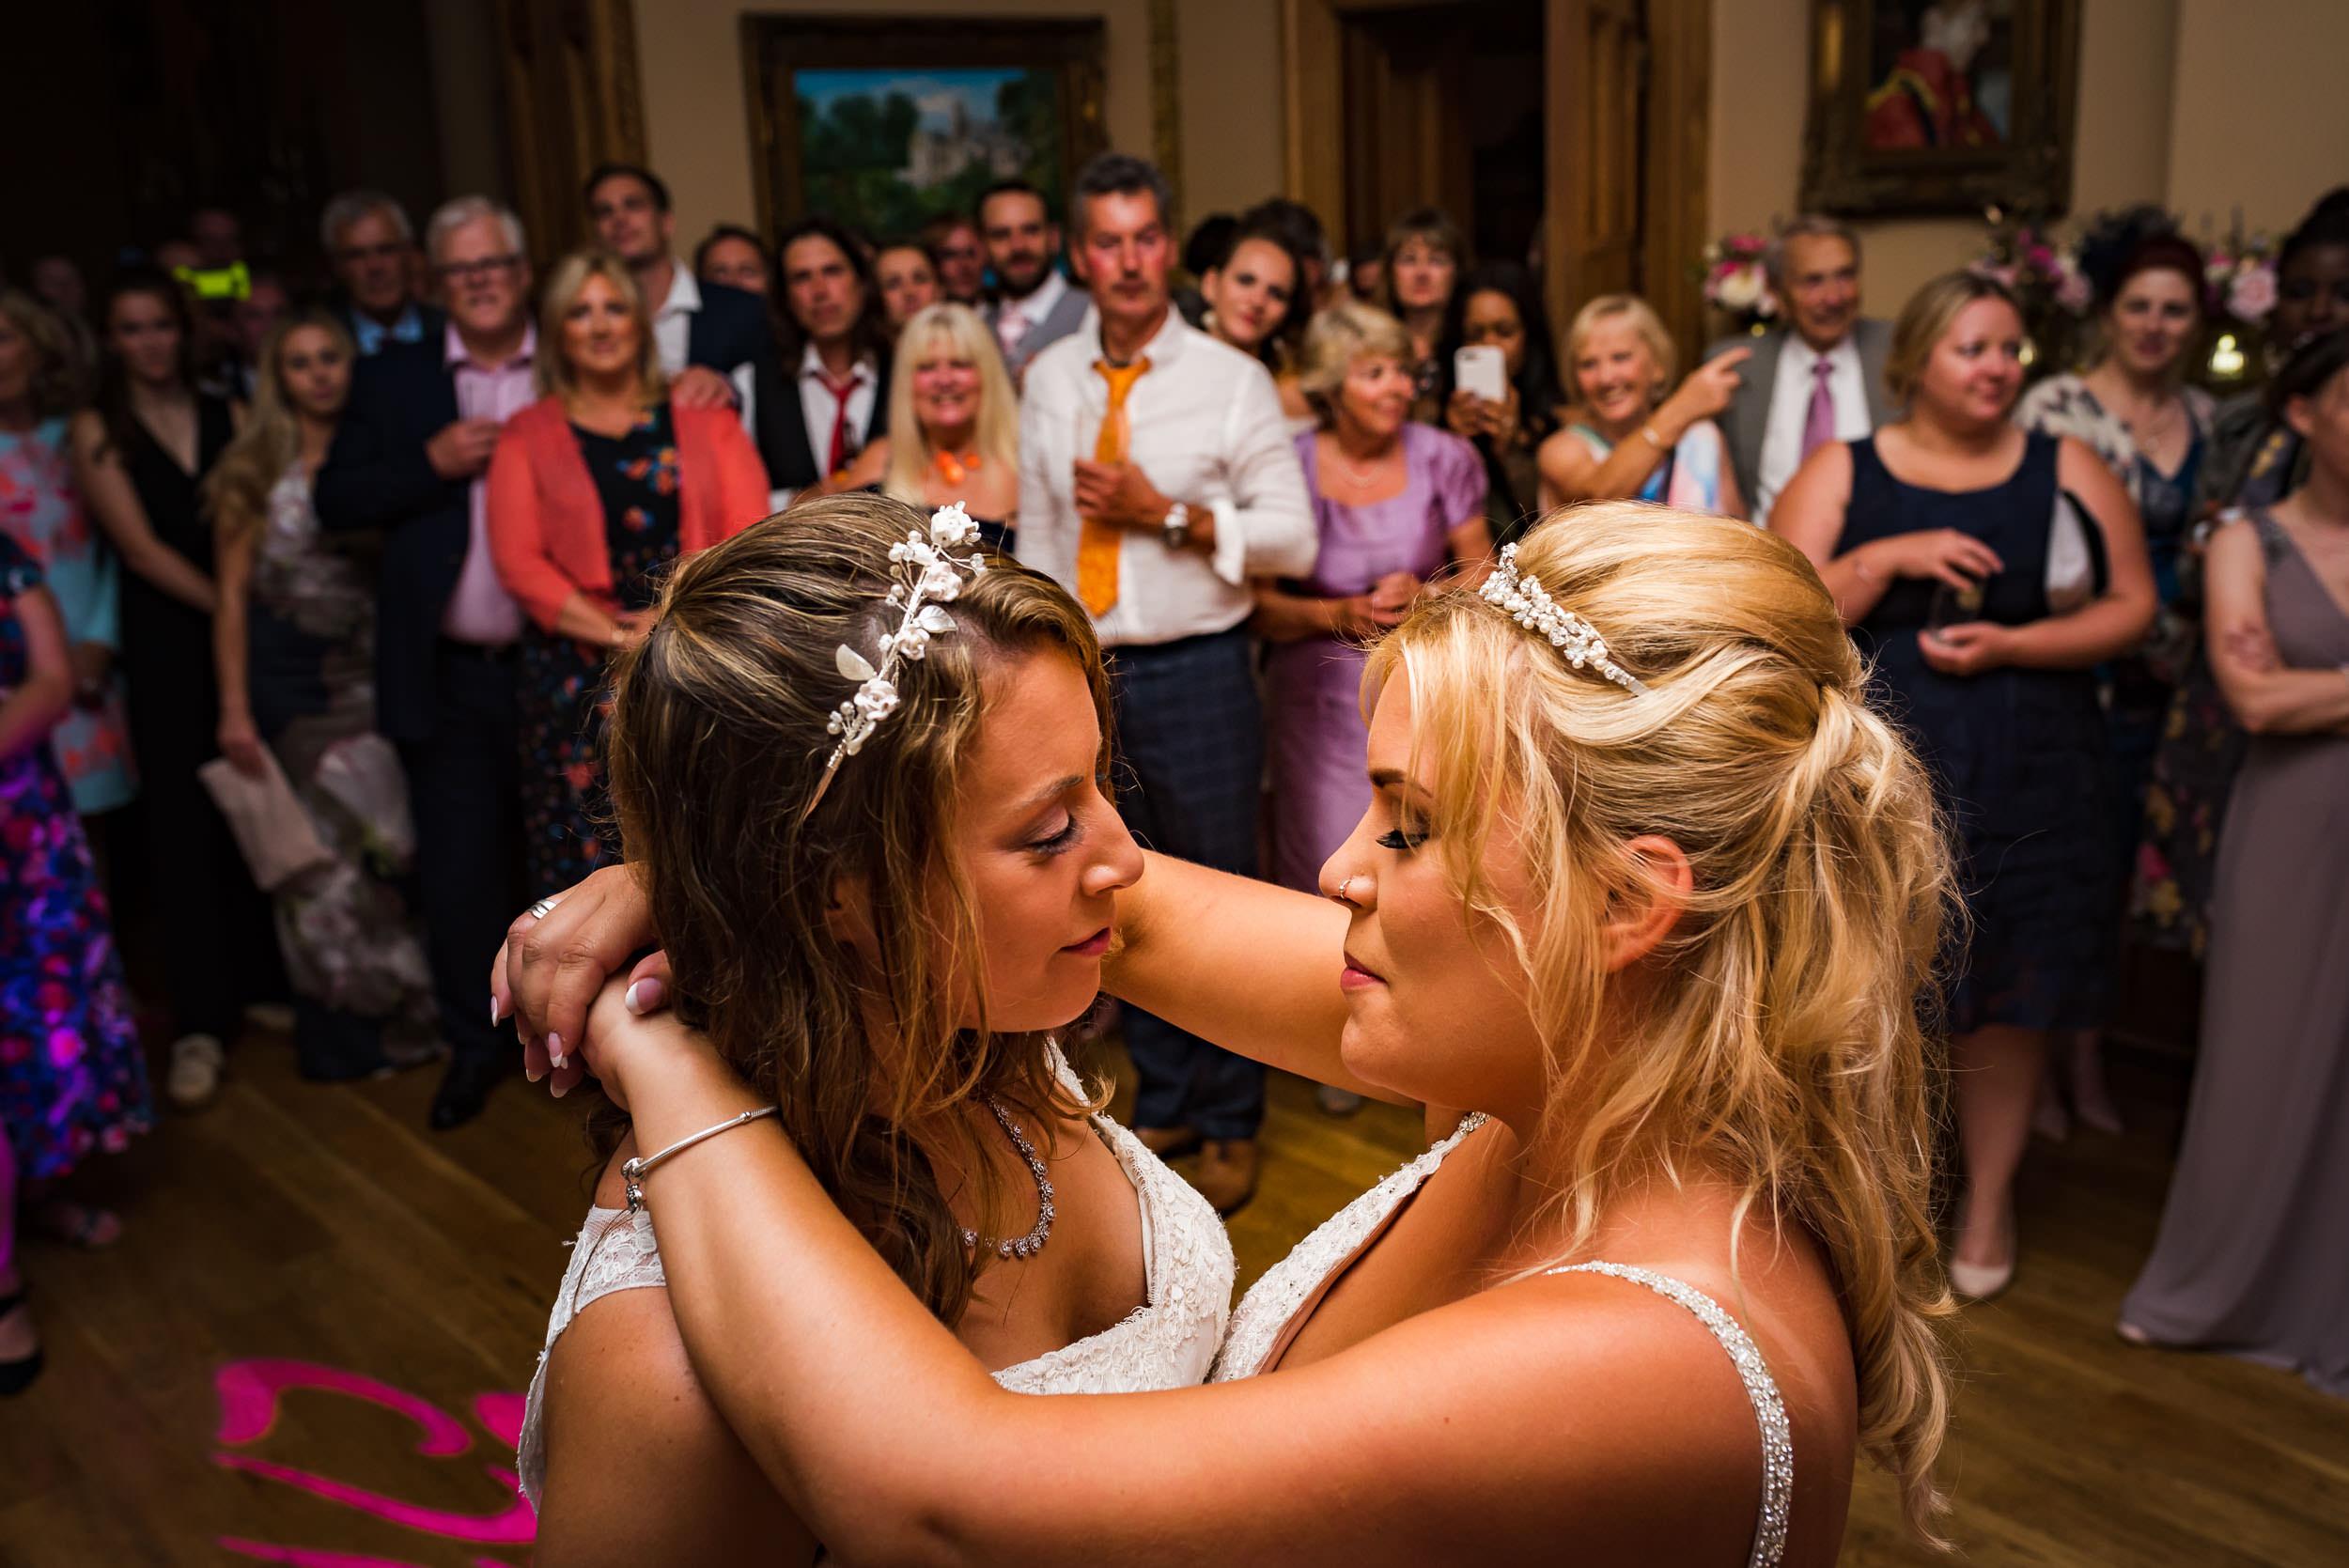 NC-20170909-2017-09-09_livvy-and-alice-wedding-0367.jpg